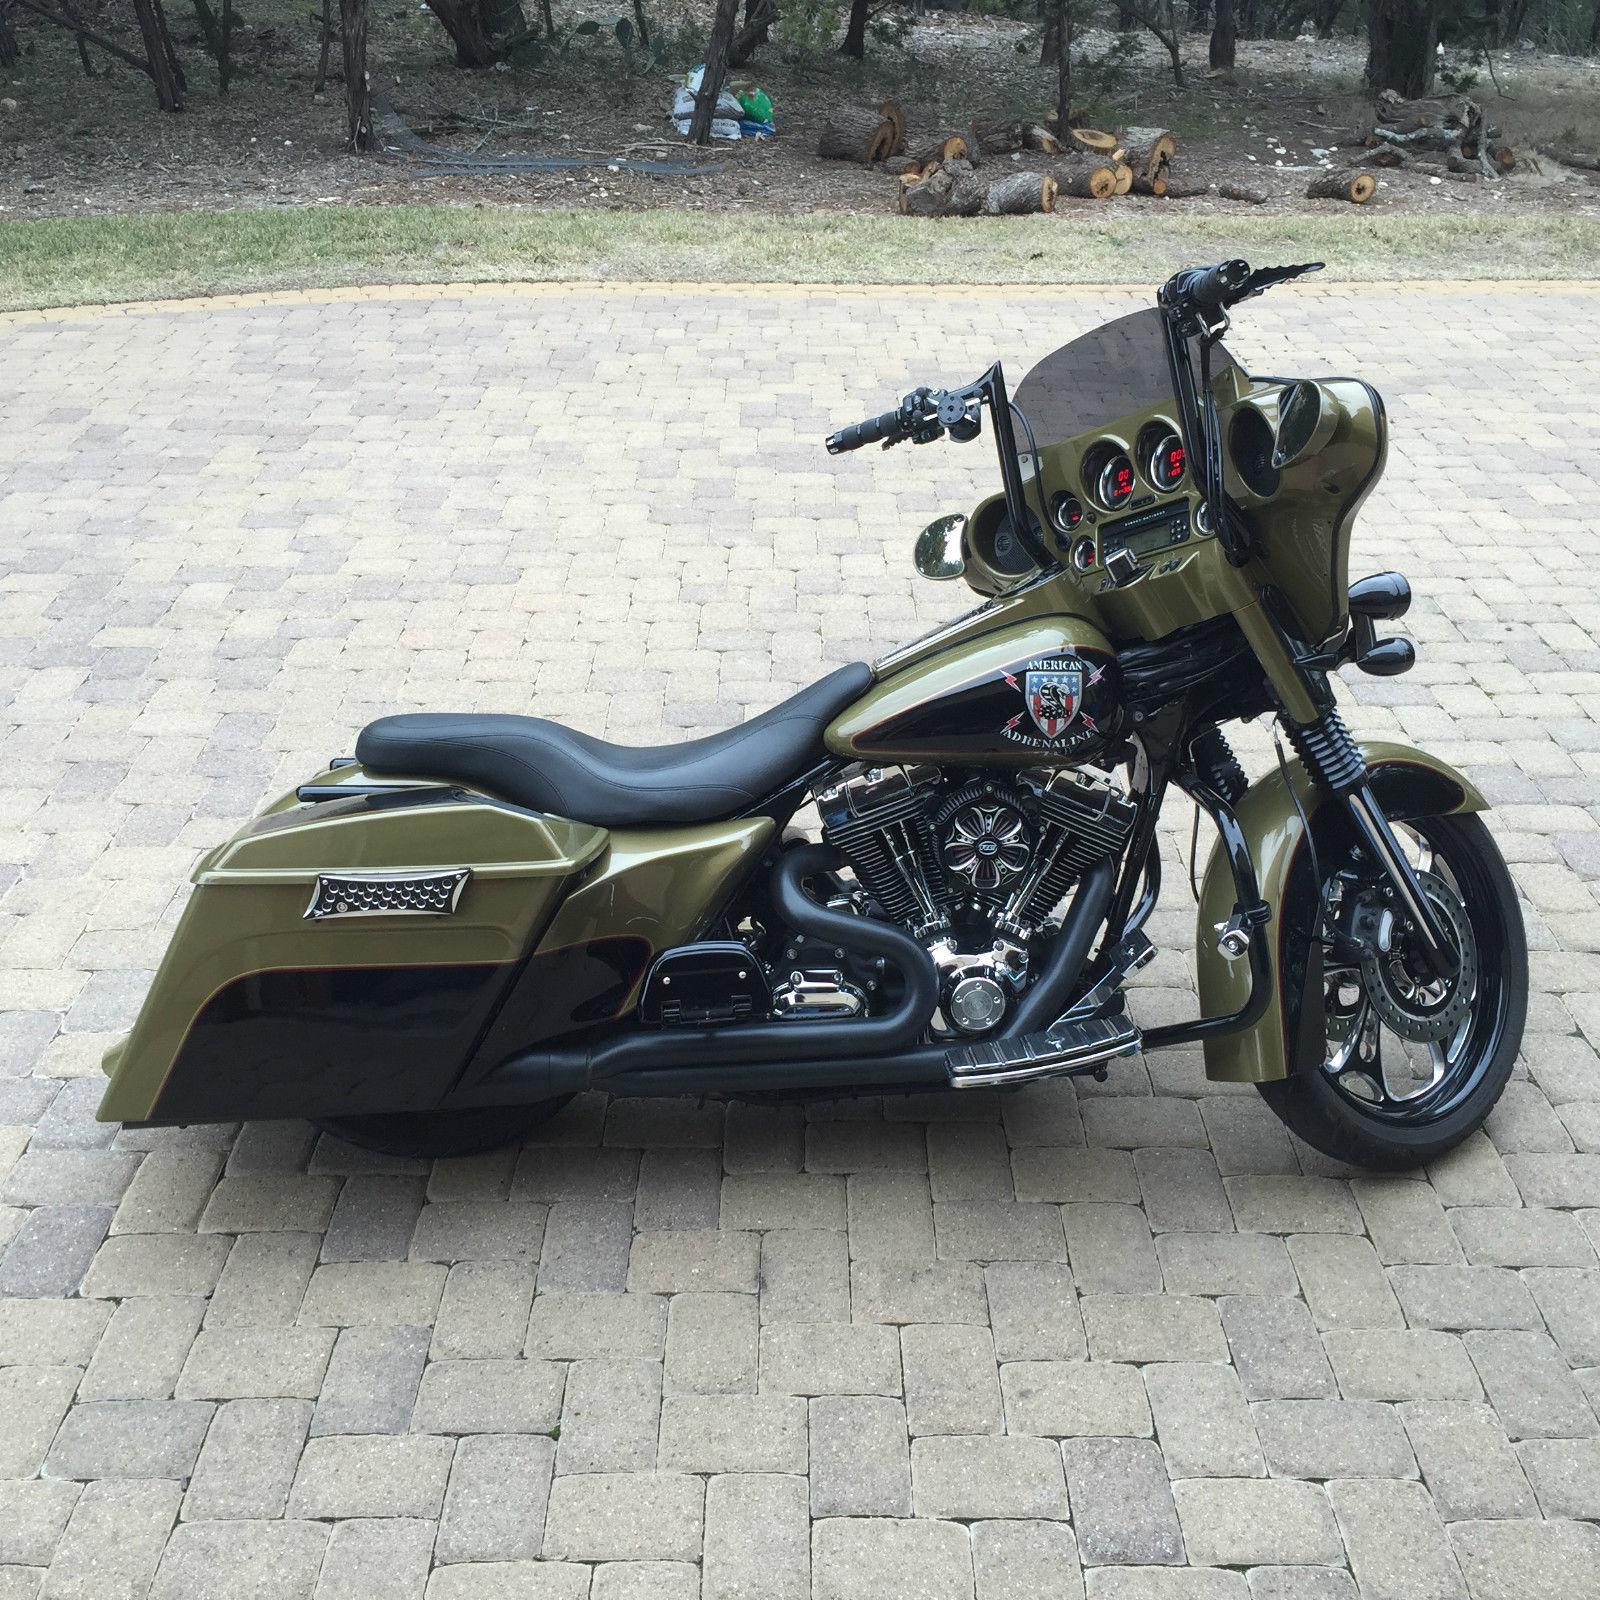 Harley Davidson Electra Glide Tire Size